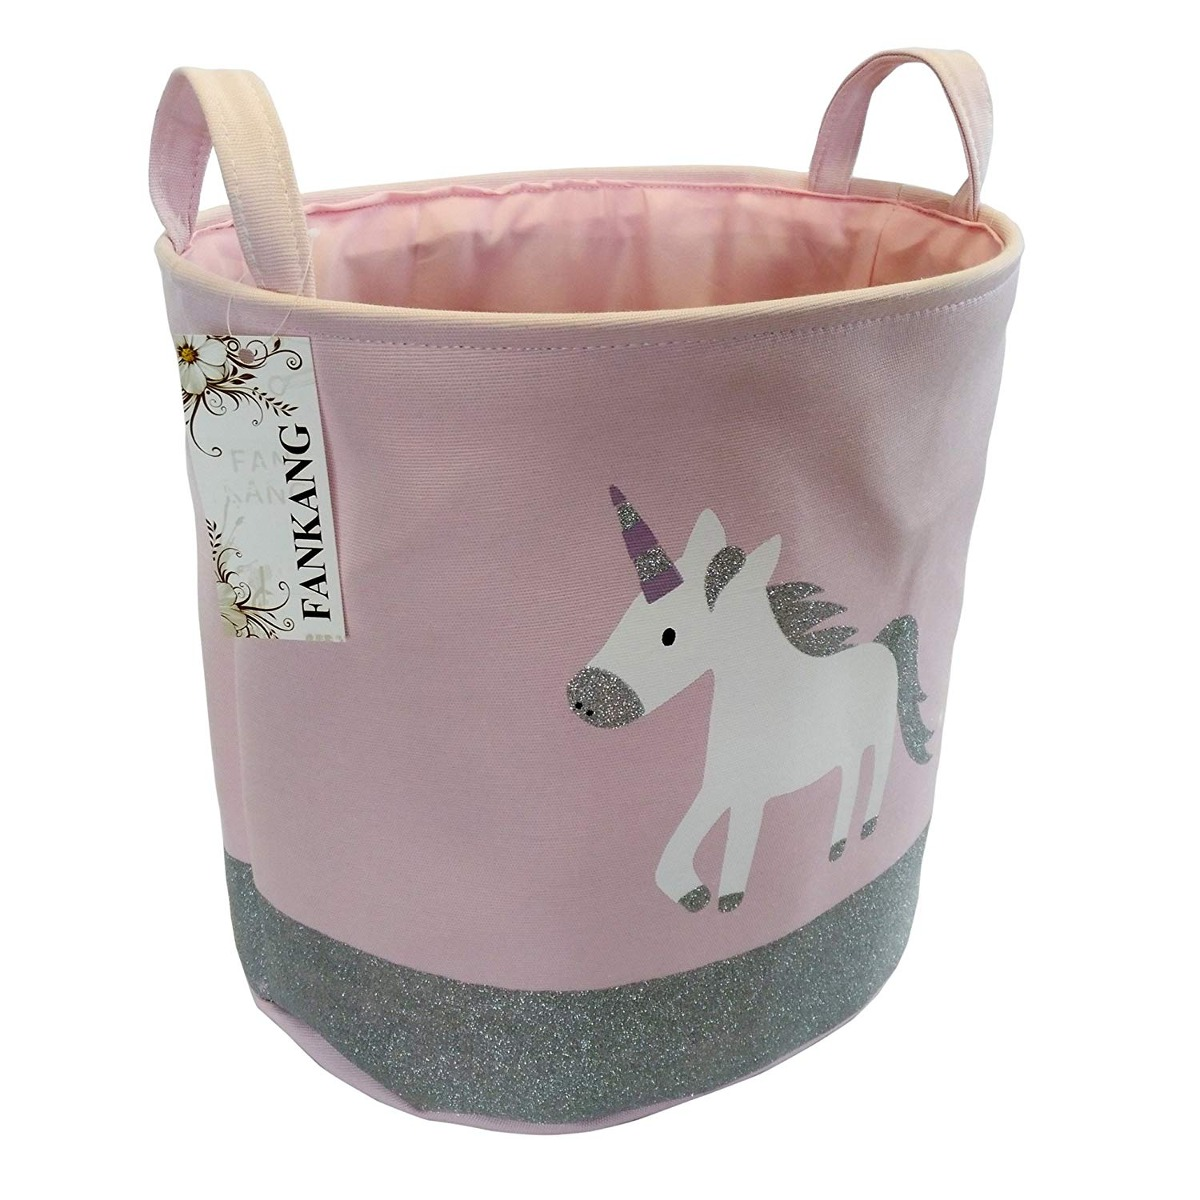 Canasta Fankang Grande Para Ropa Juguetes -rosa - $ 899.00 en ...